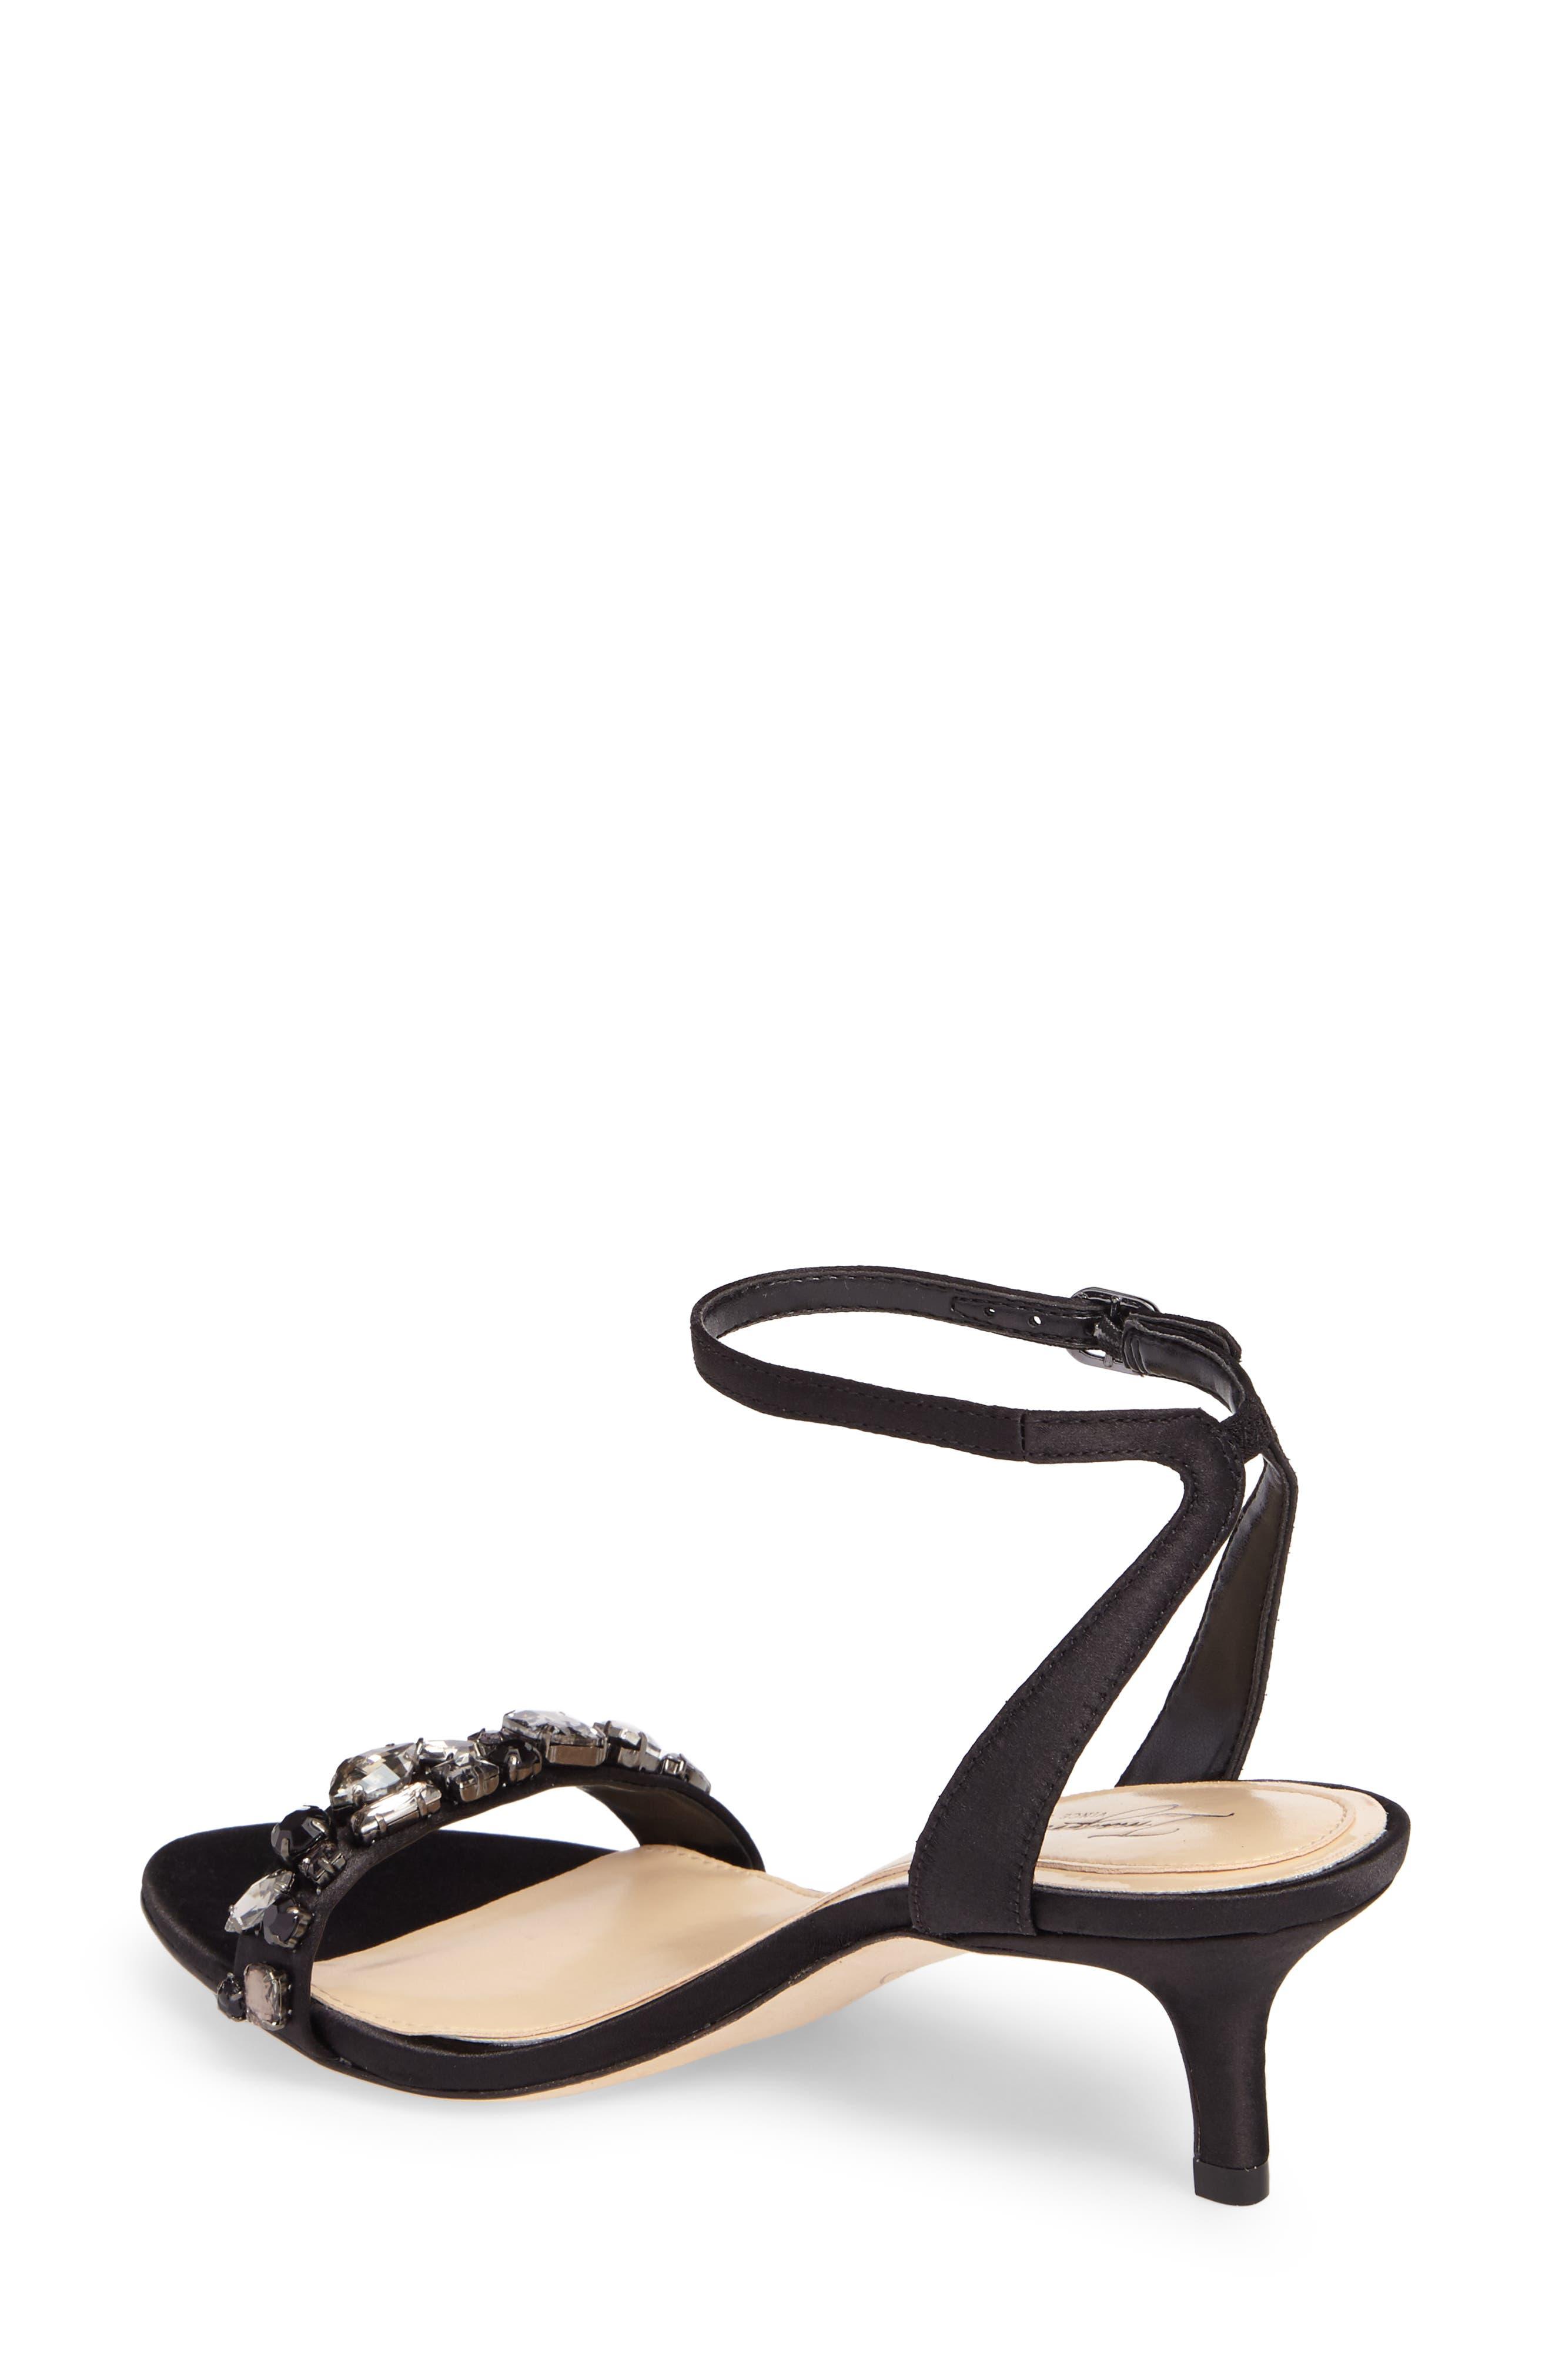 Imagine Vince Camuto Kolo Embellished Kitten Heel Sandal,                             Alternate thumbnail 2, color,                             001